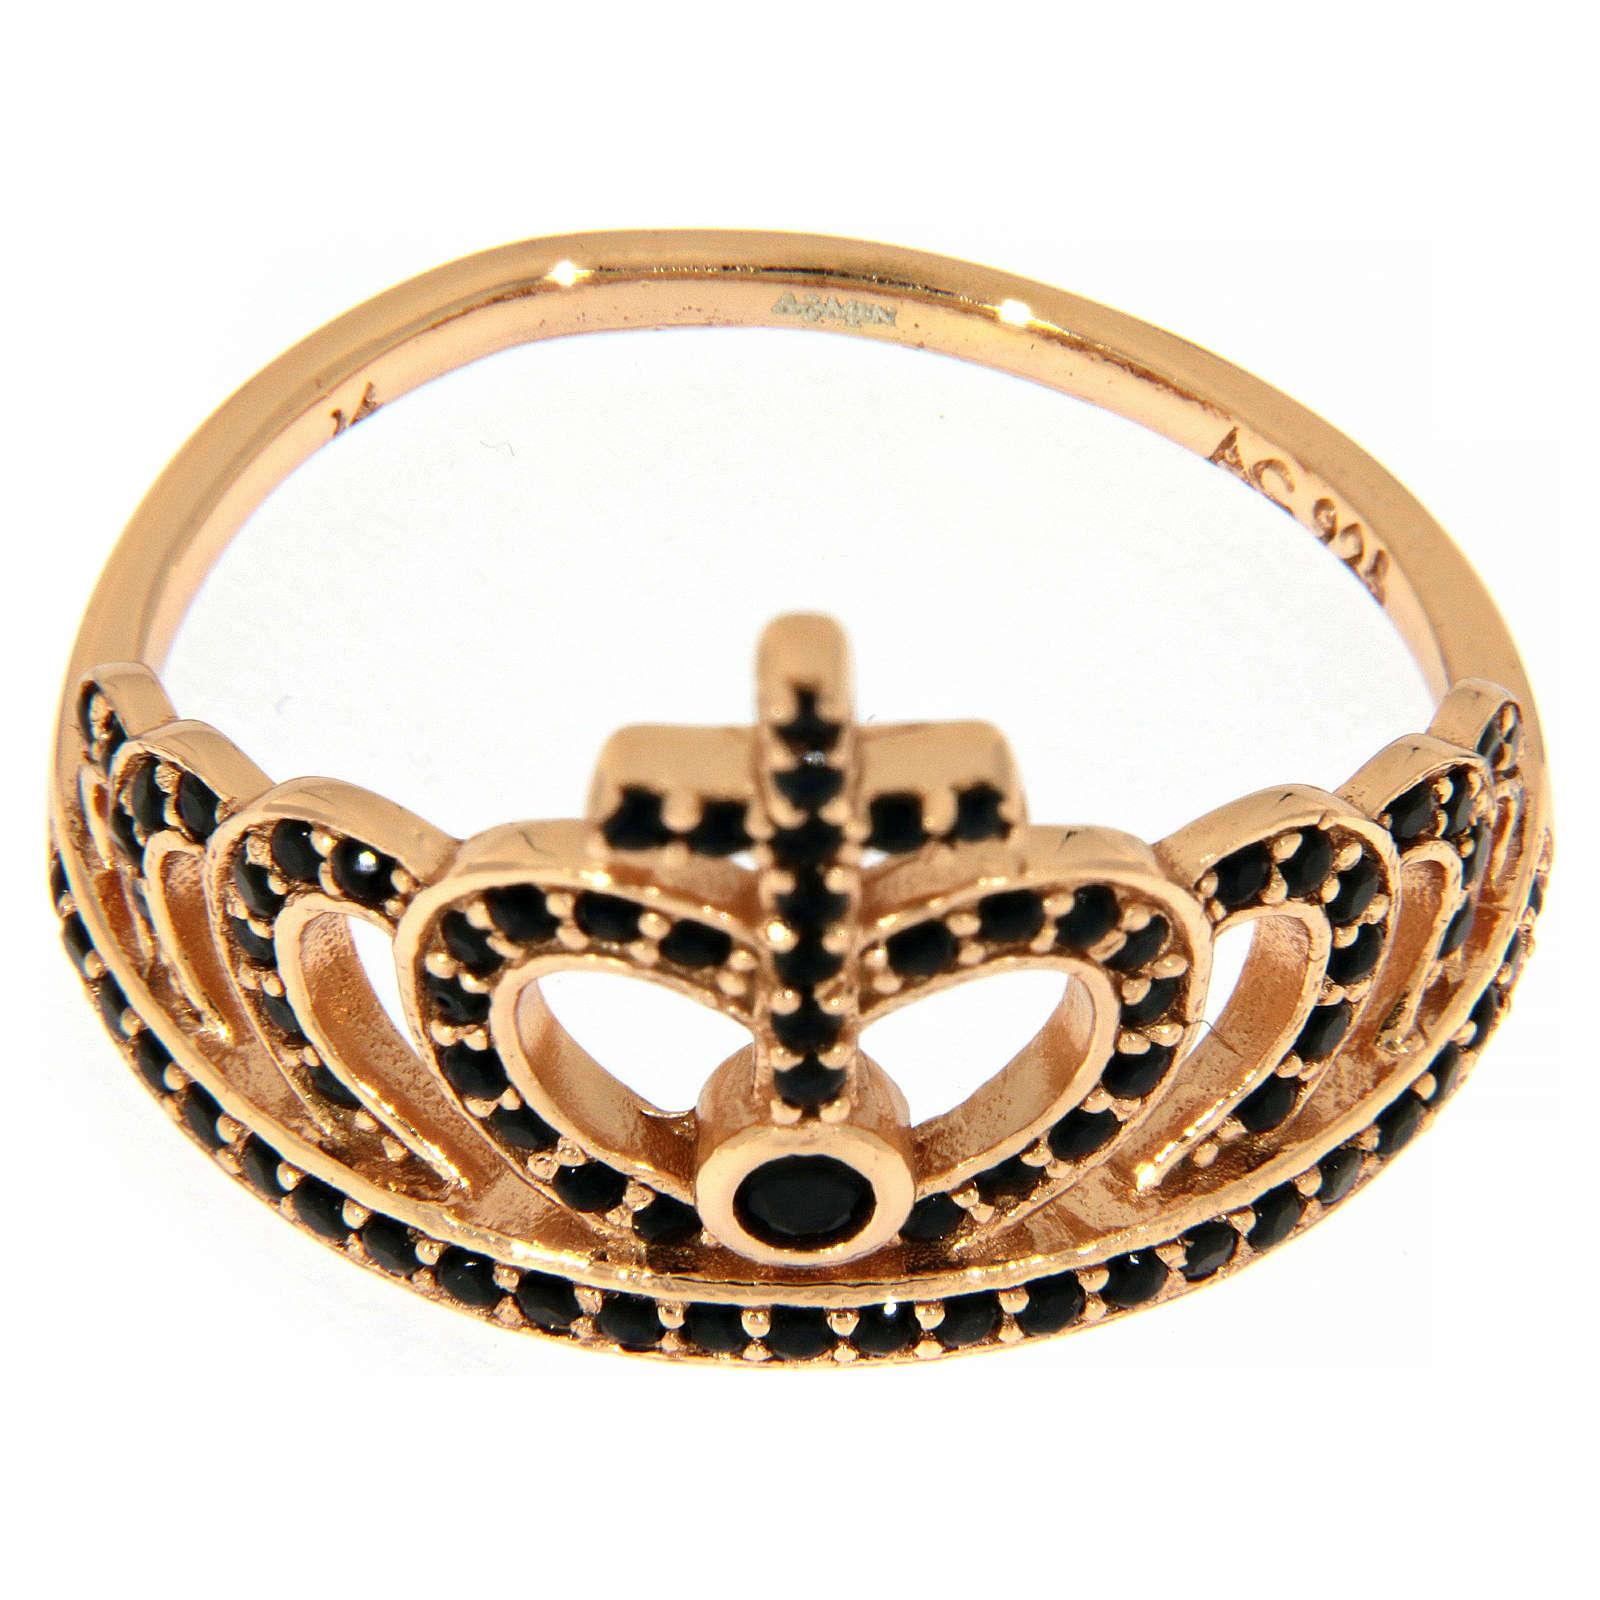 Anello AMEN argento 925 rosé corona zirconi neri 3